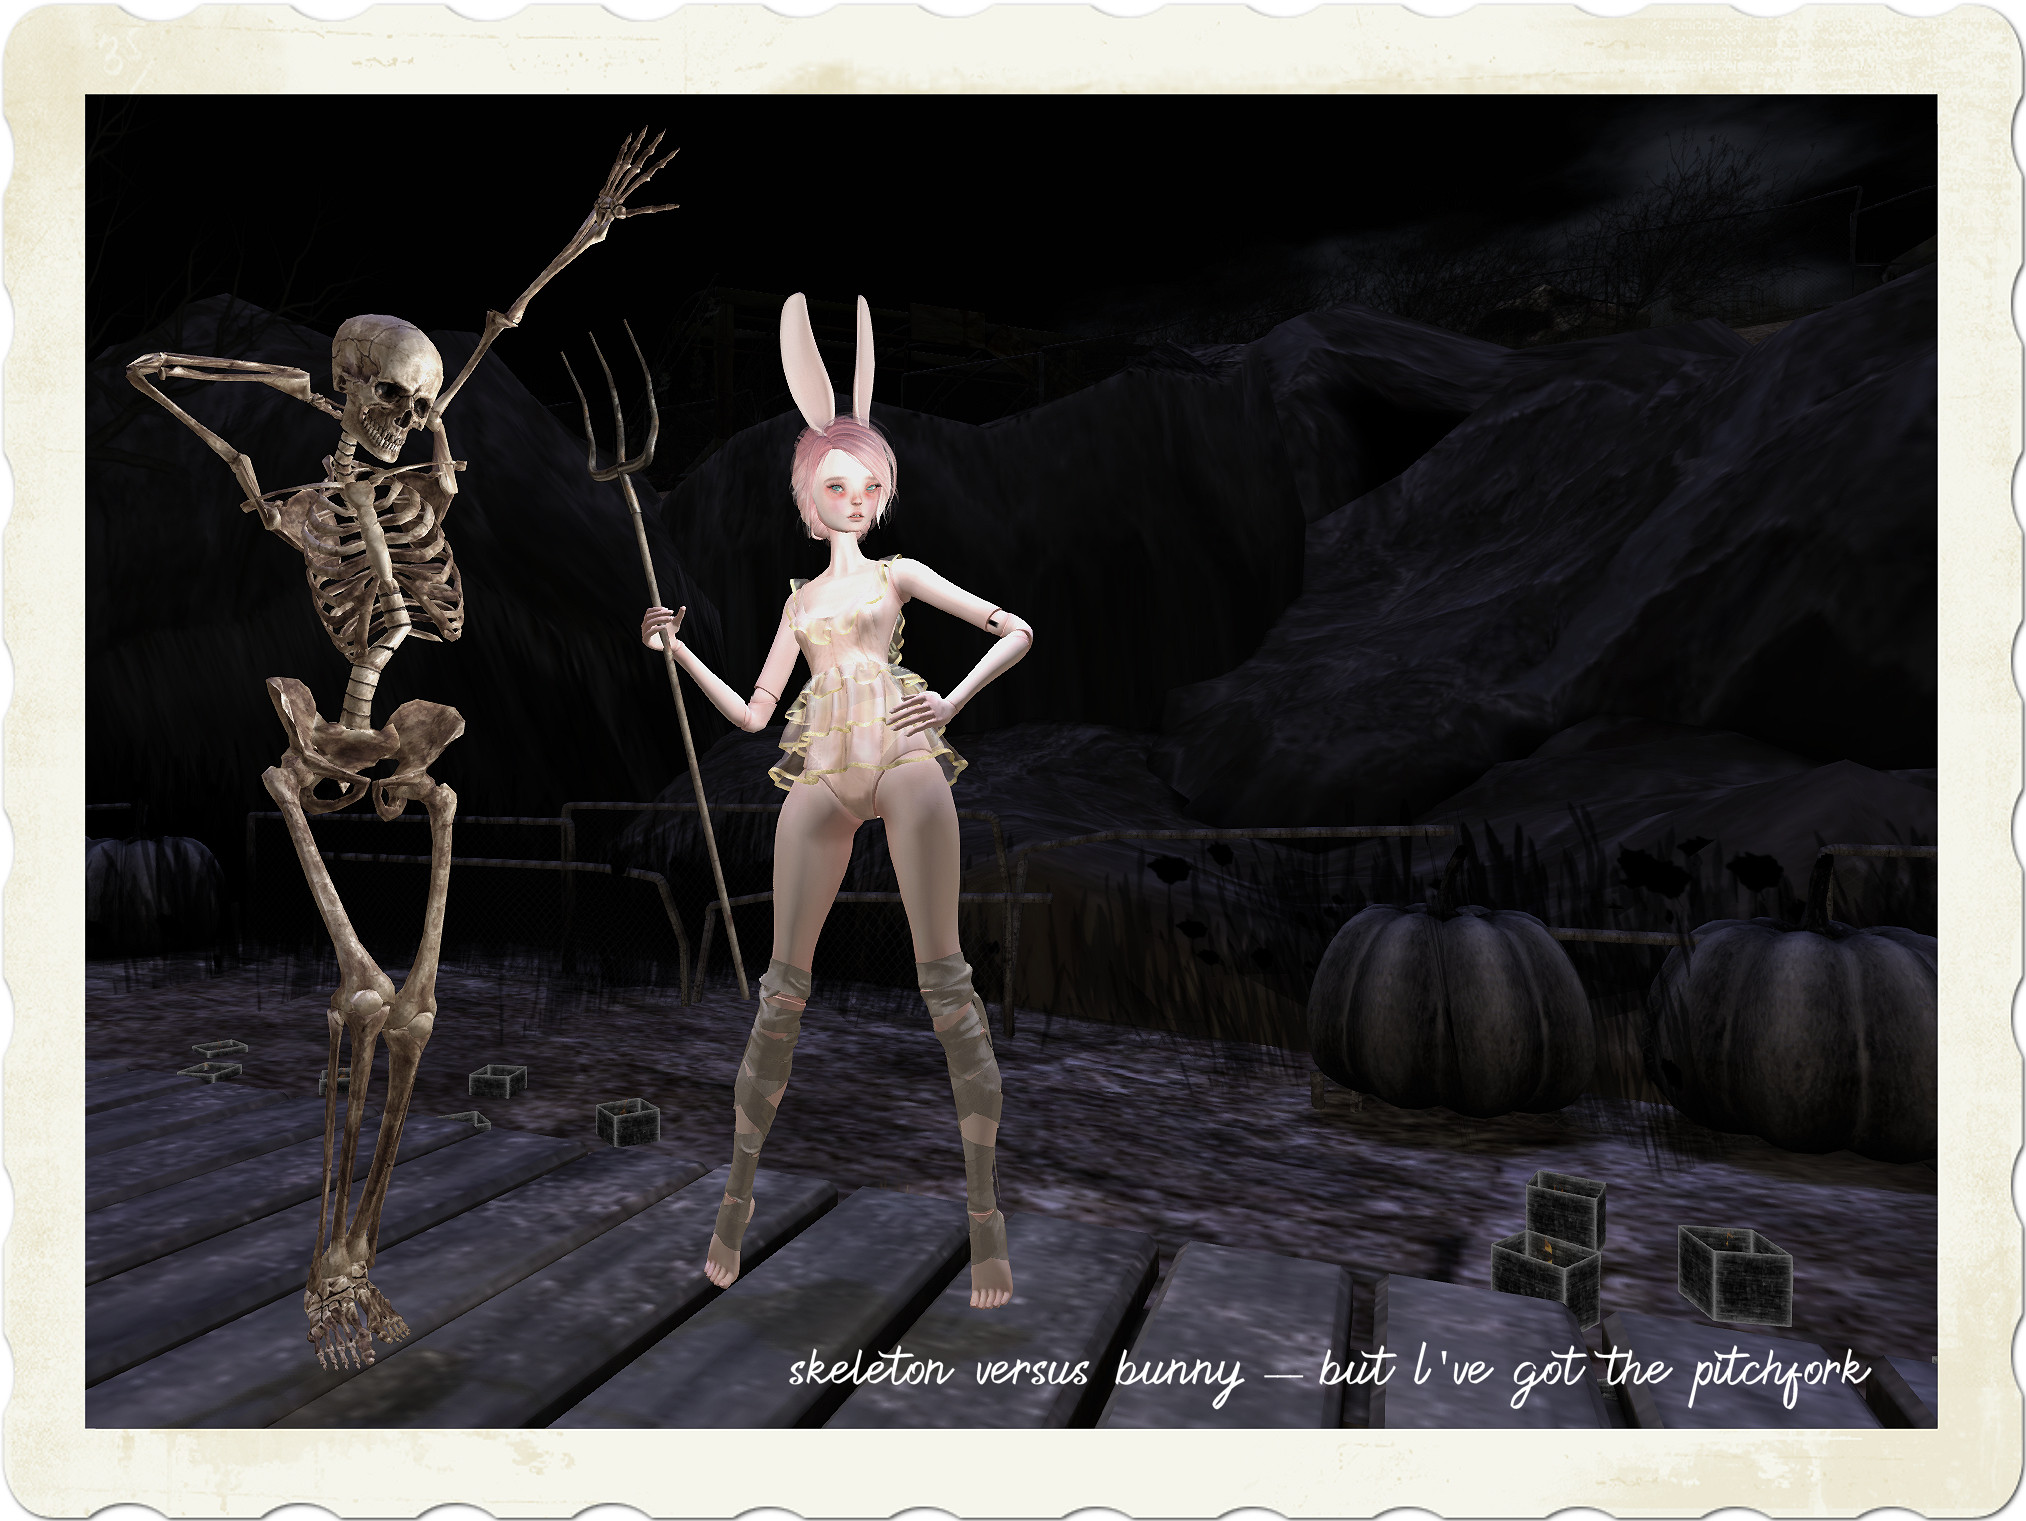 skeleton versus bunny